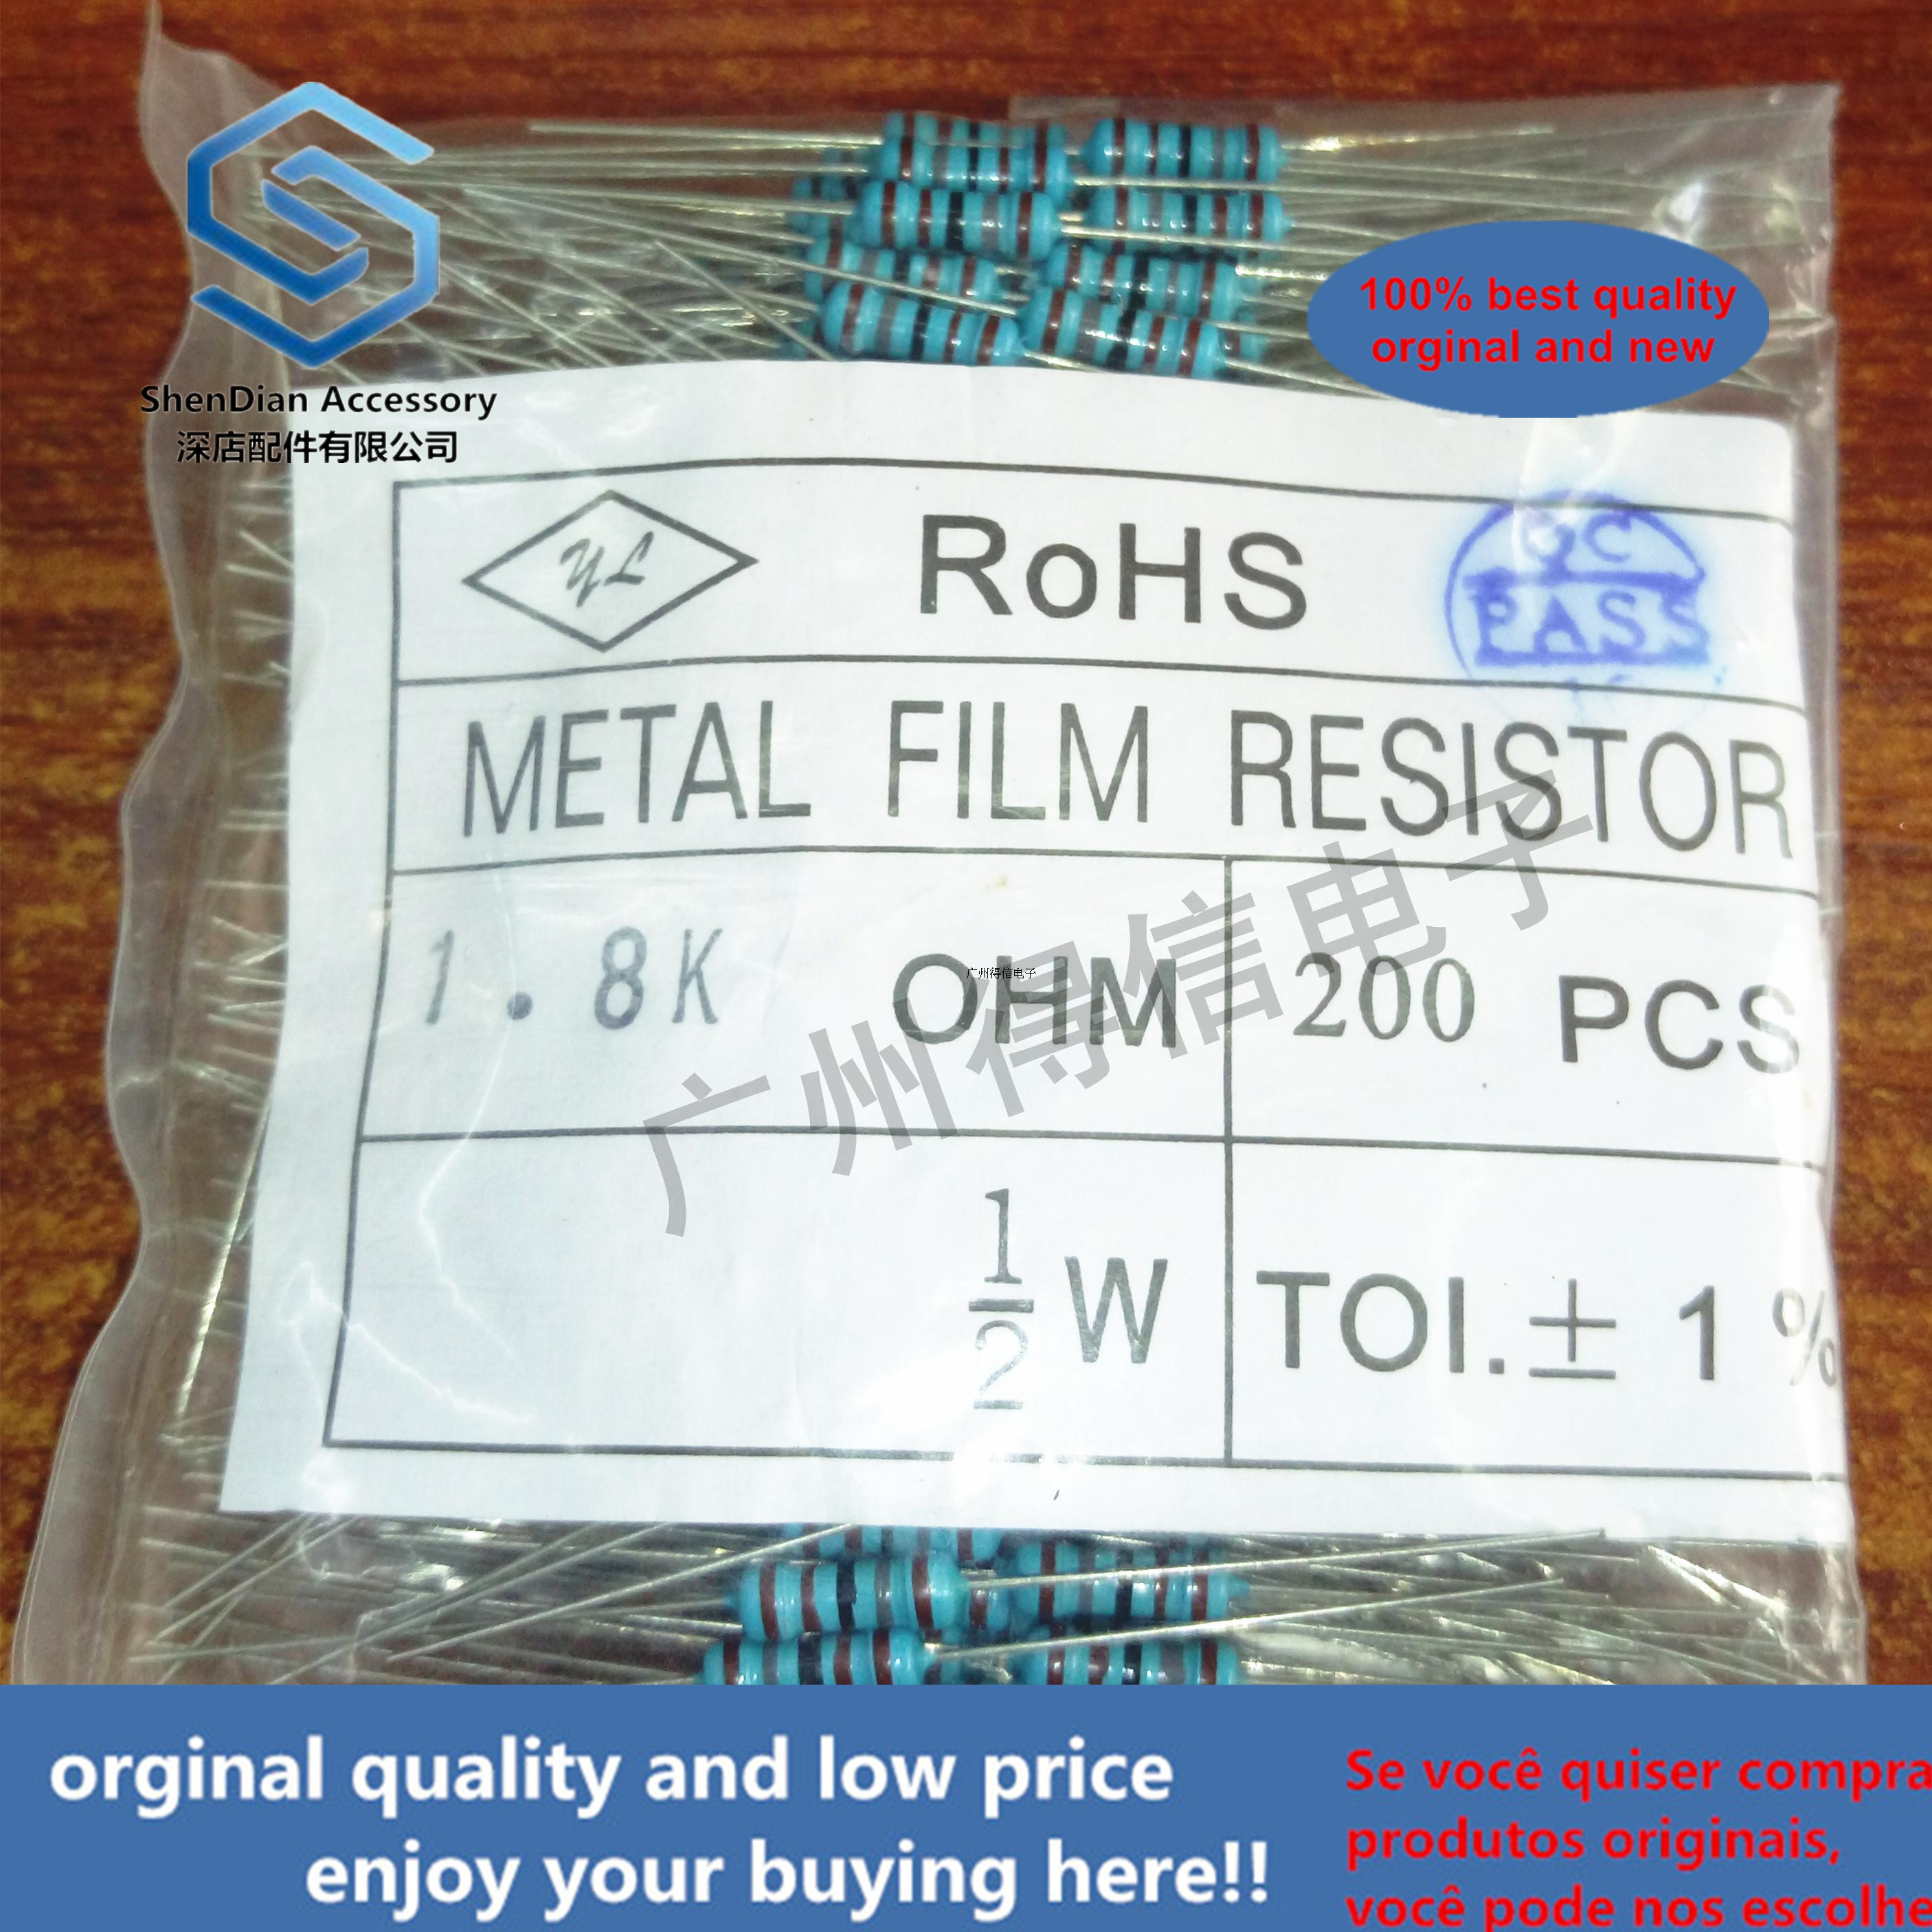 200pcs 1 / 2W 3.6R 3.6 Euro 1% Brand New Metal Film Iron Feet Resistance Bag Pack 200 Pcs